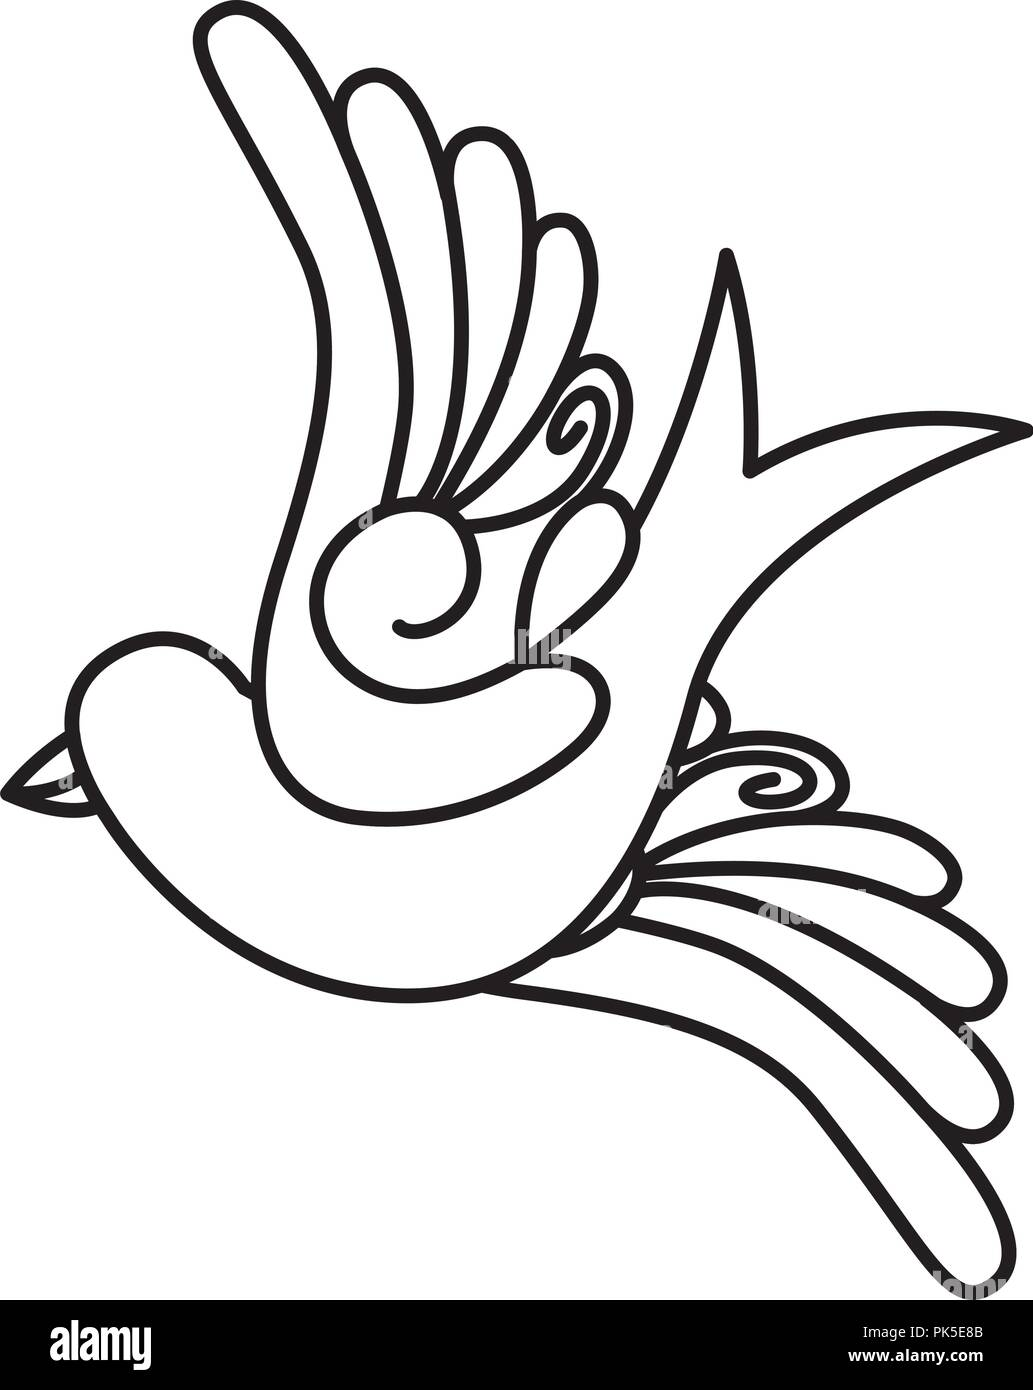 Flying bird cartoon black and white - photo#42